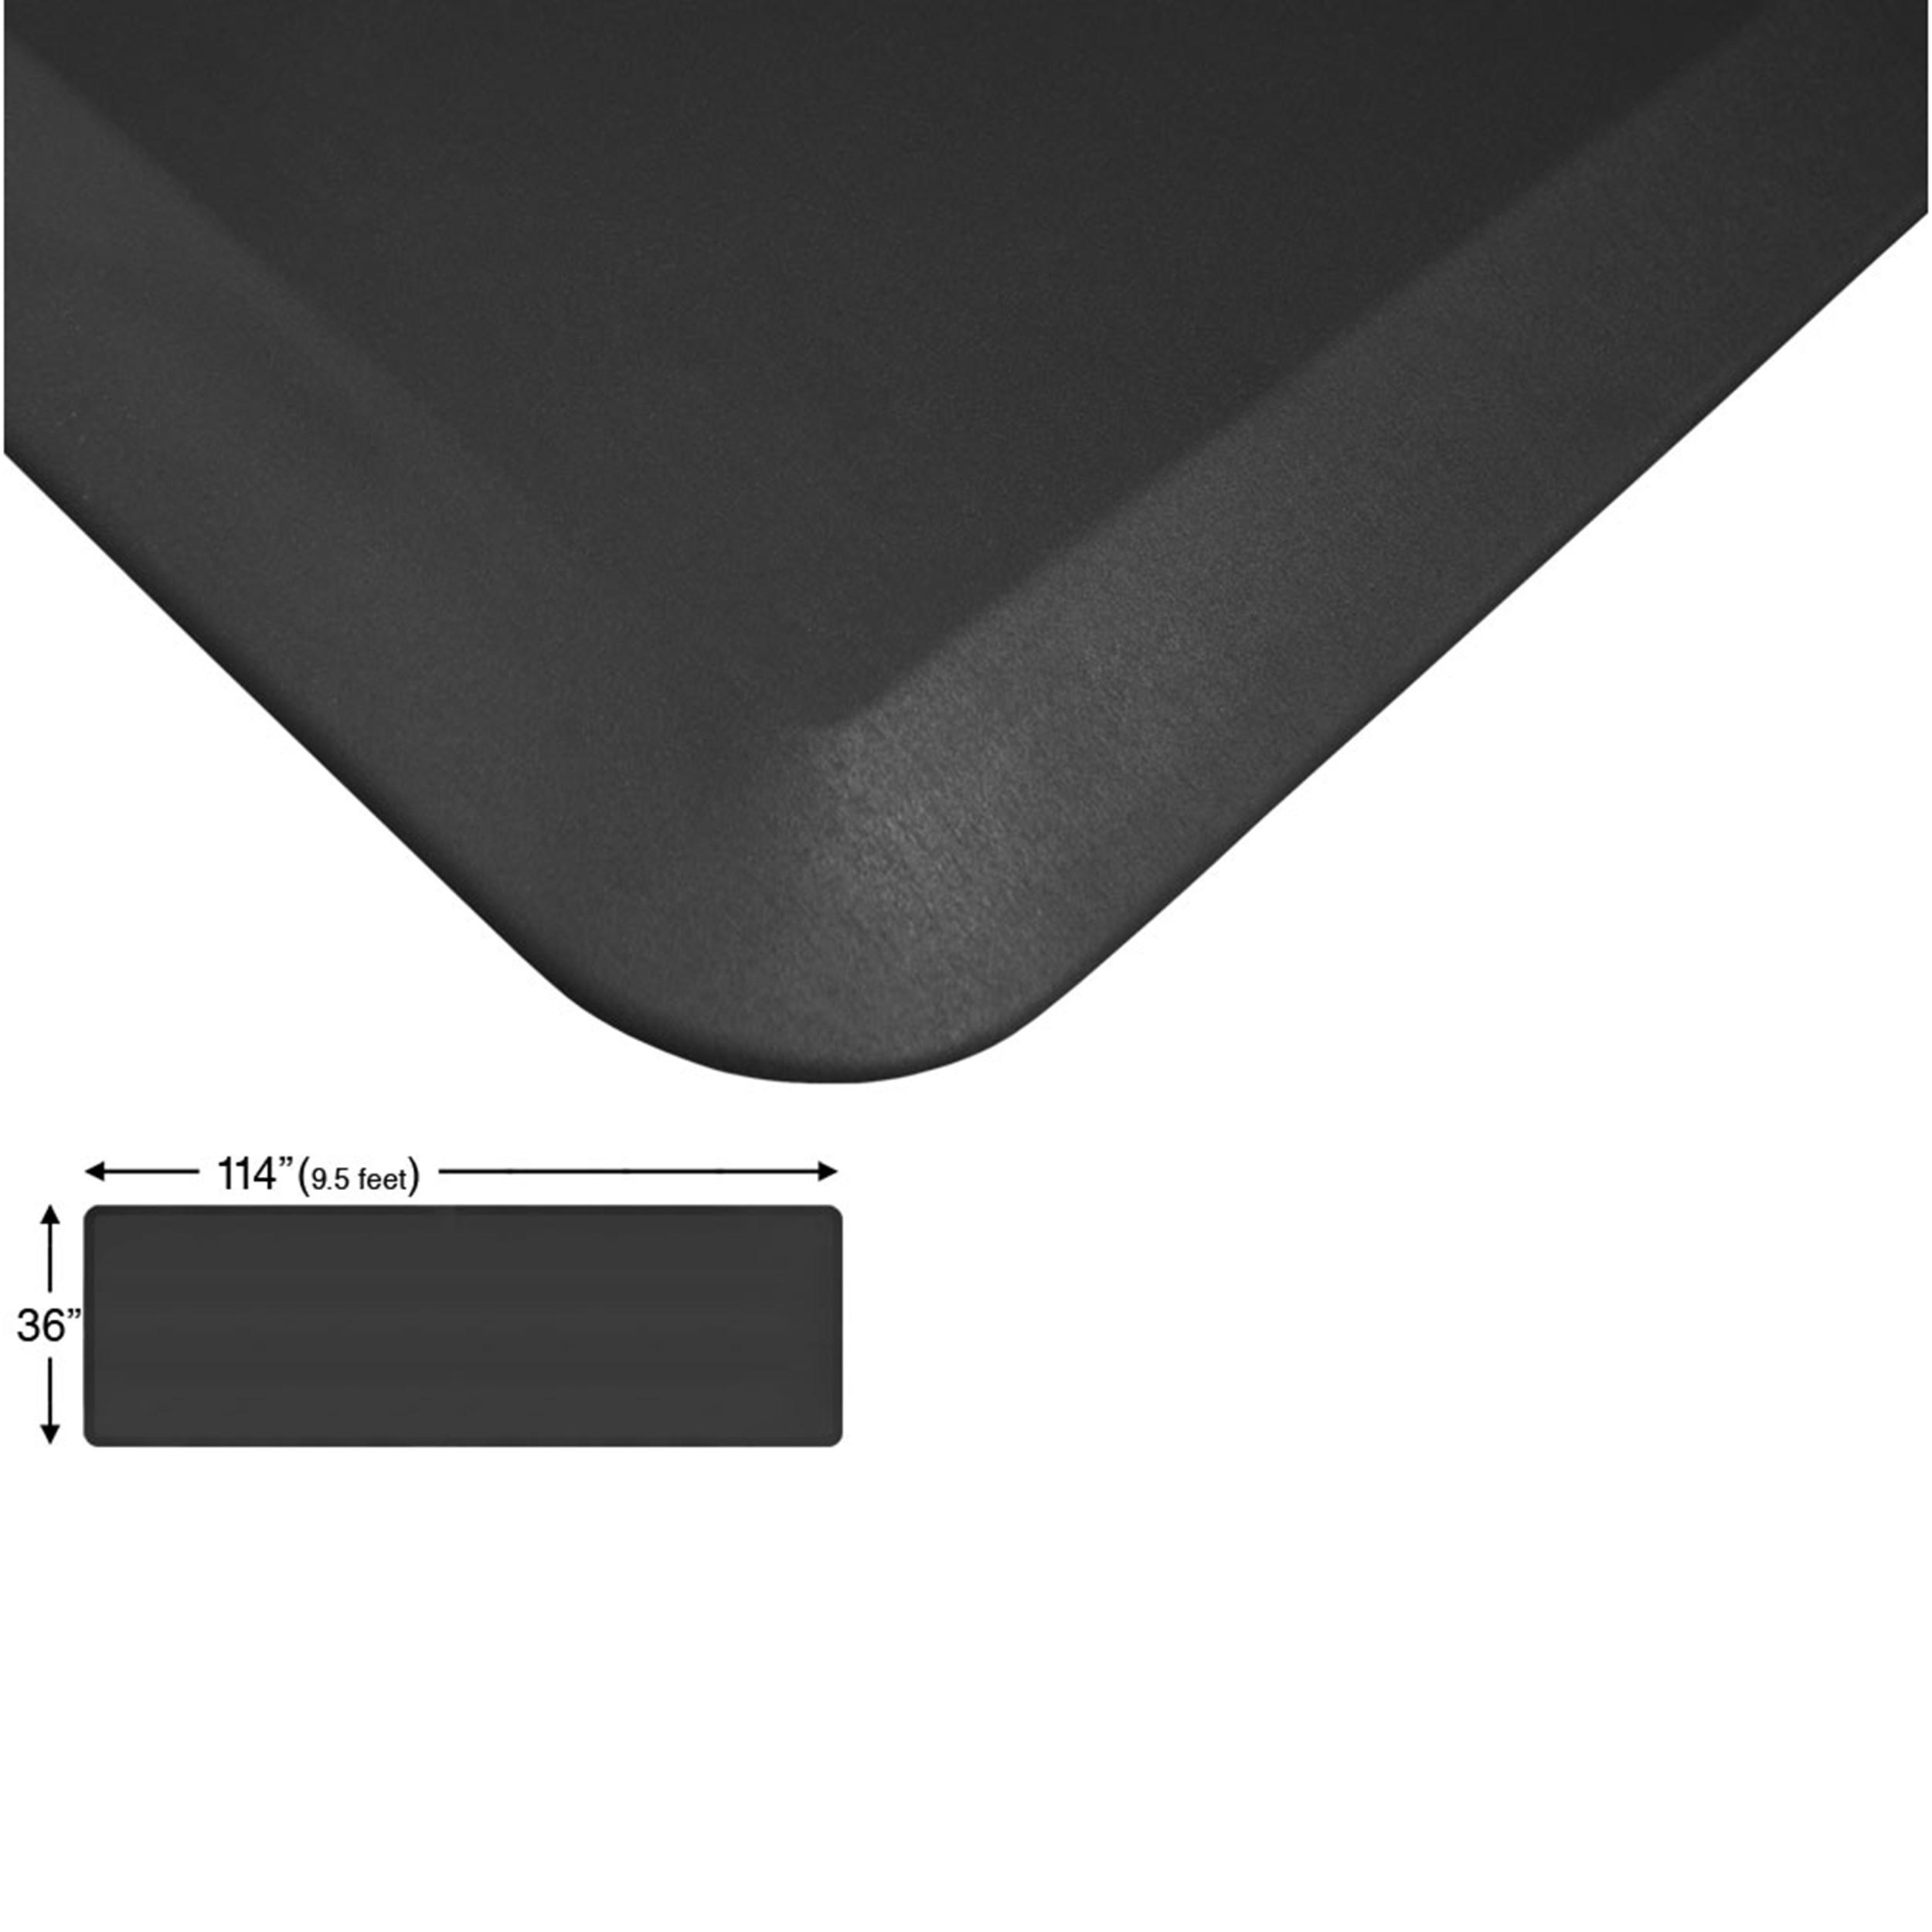 Eco-Pro Continuous Comfort Mat, Black, 36